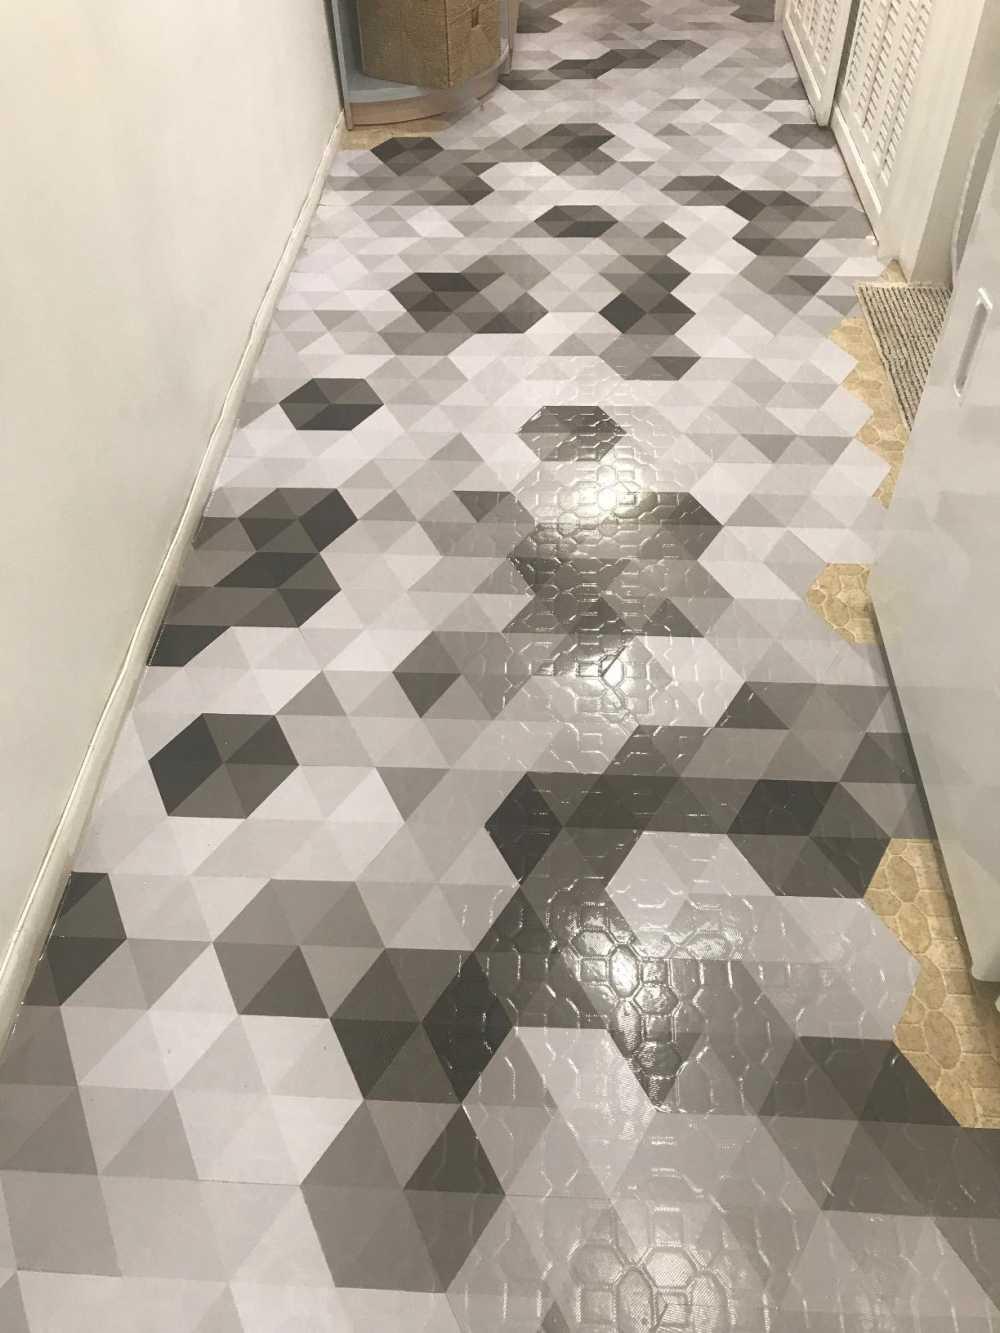 Funlife Self Adhesive Floor Tiles Sticker Waterproof Bathroom Kitchen Decor Anti Skid Modern Stickers For Entrance Tile